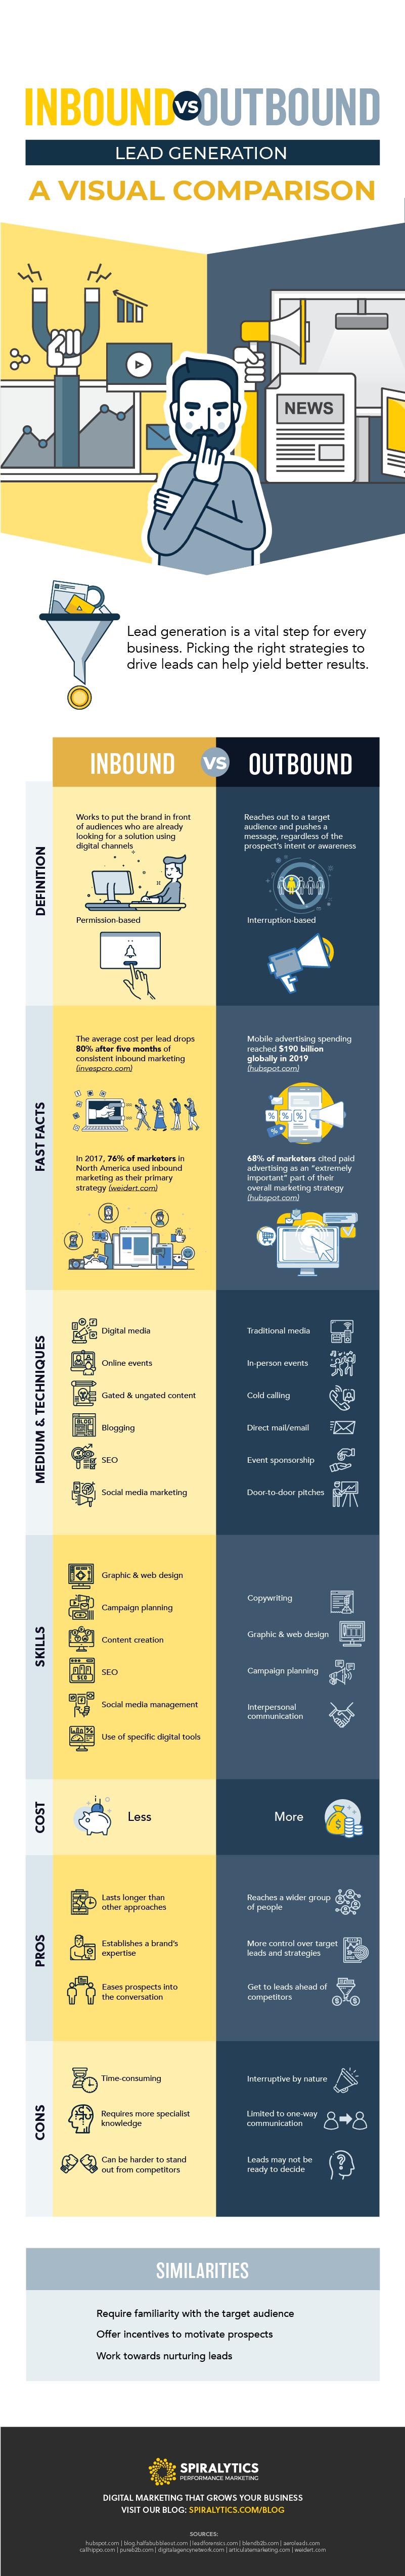 Inbound vs. Outbound Lead Generation: A Visual Comparison #infographic